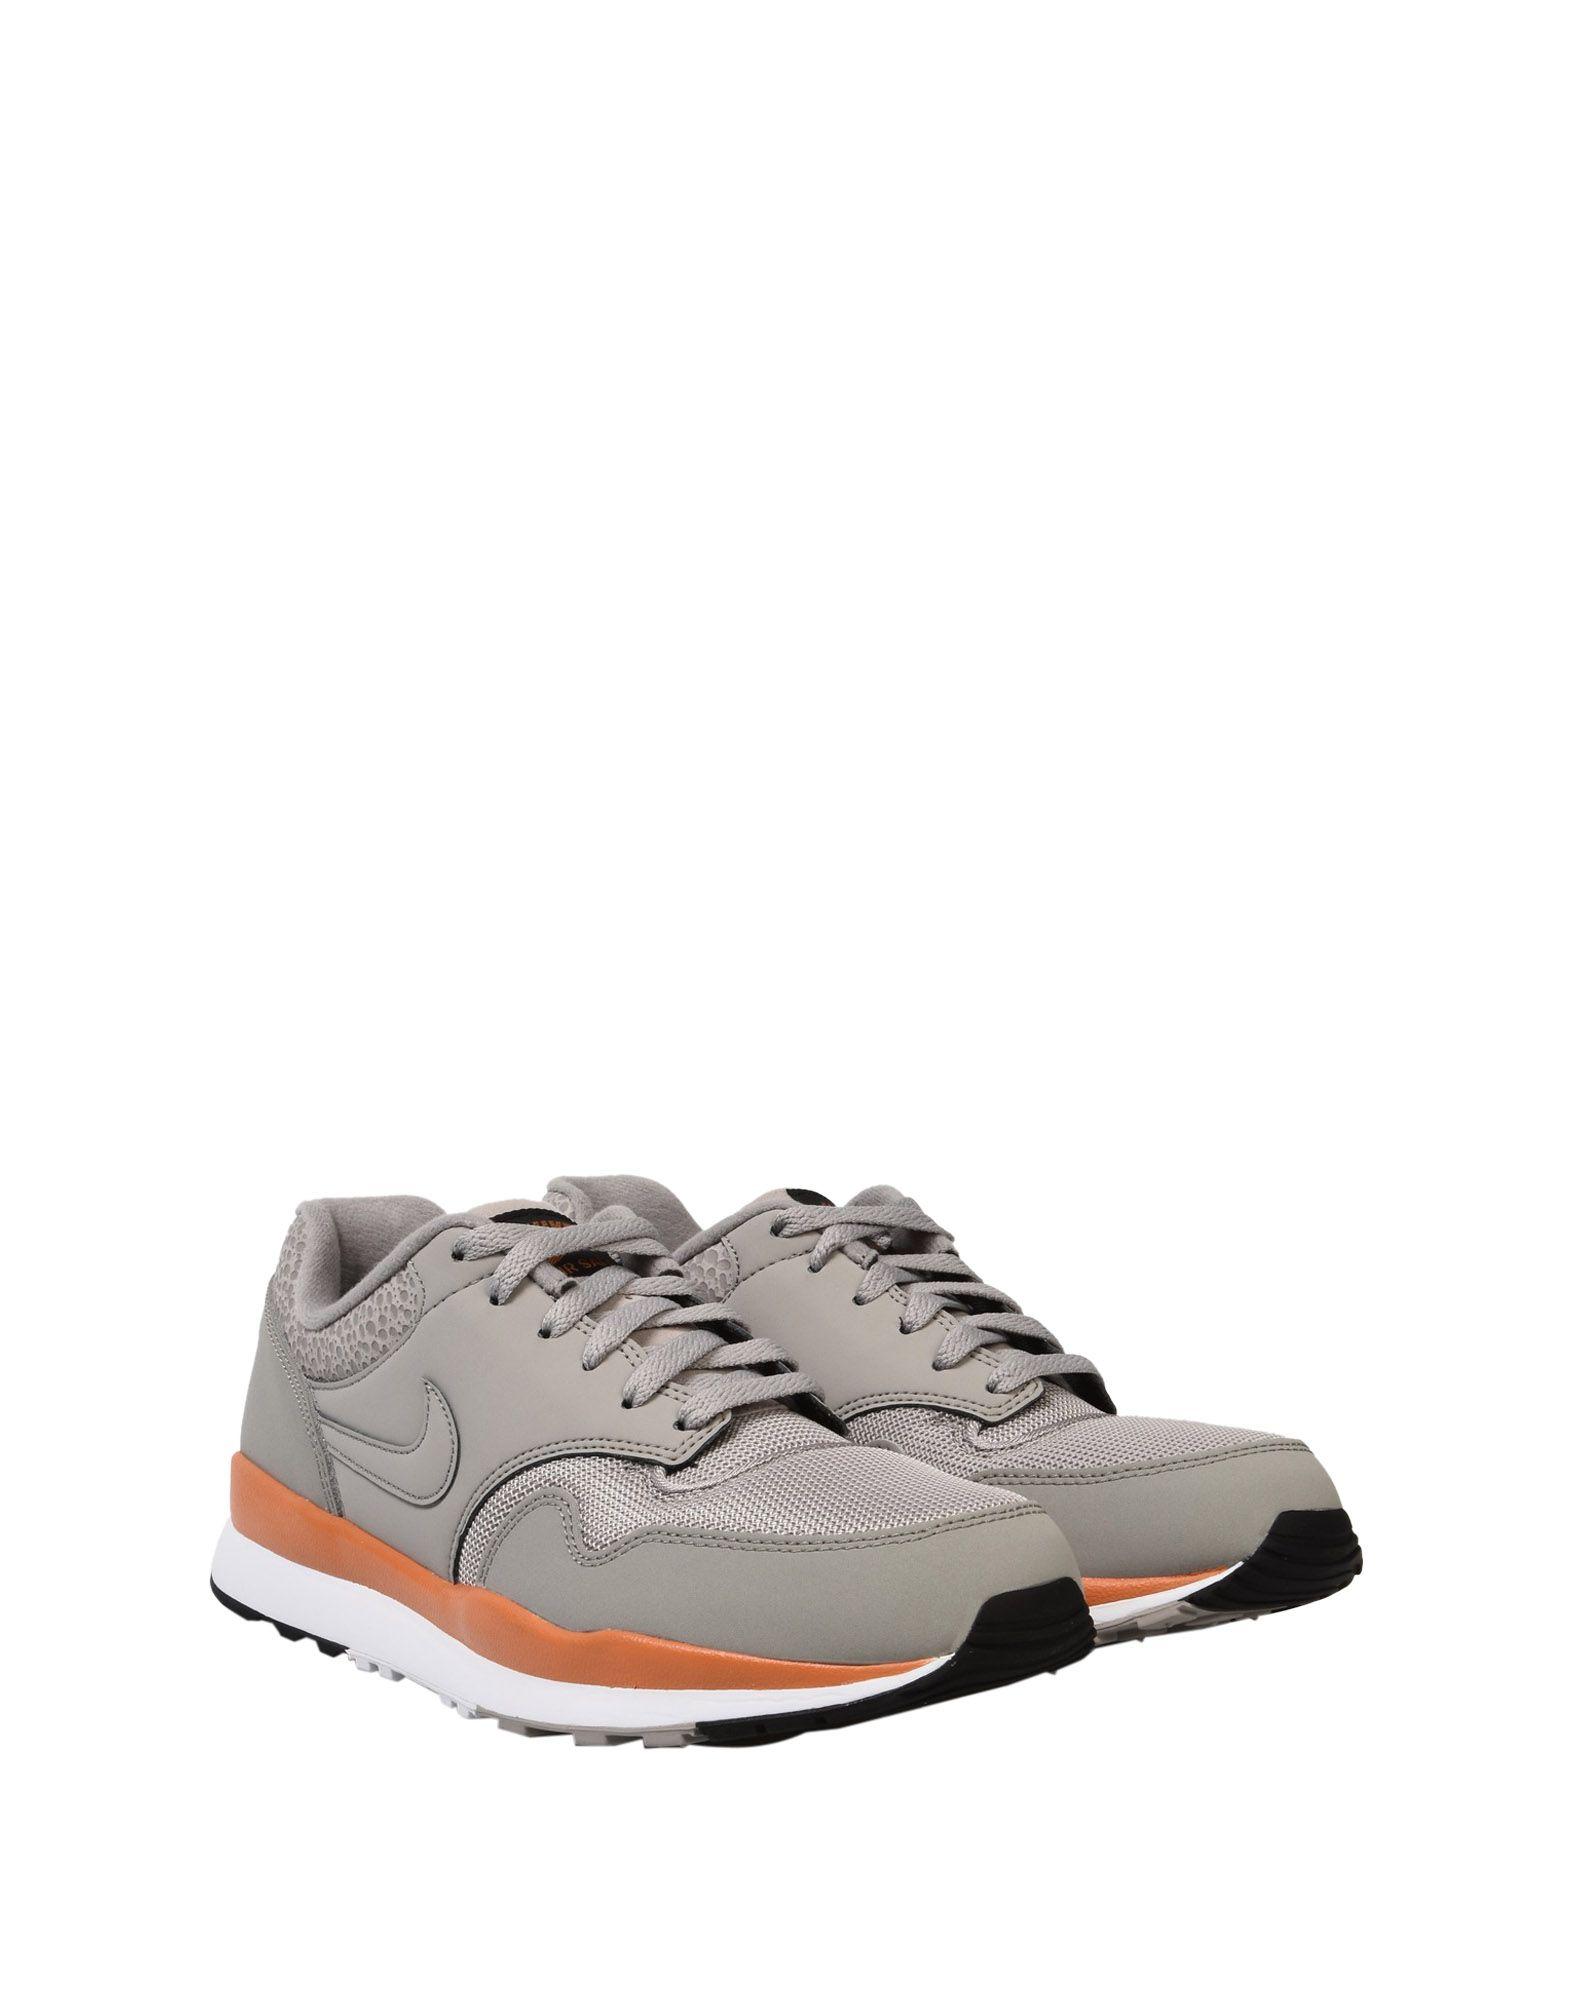 Nike   Air Safari   11525945FI Neue Schuhe 900367